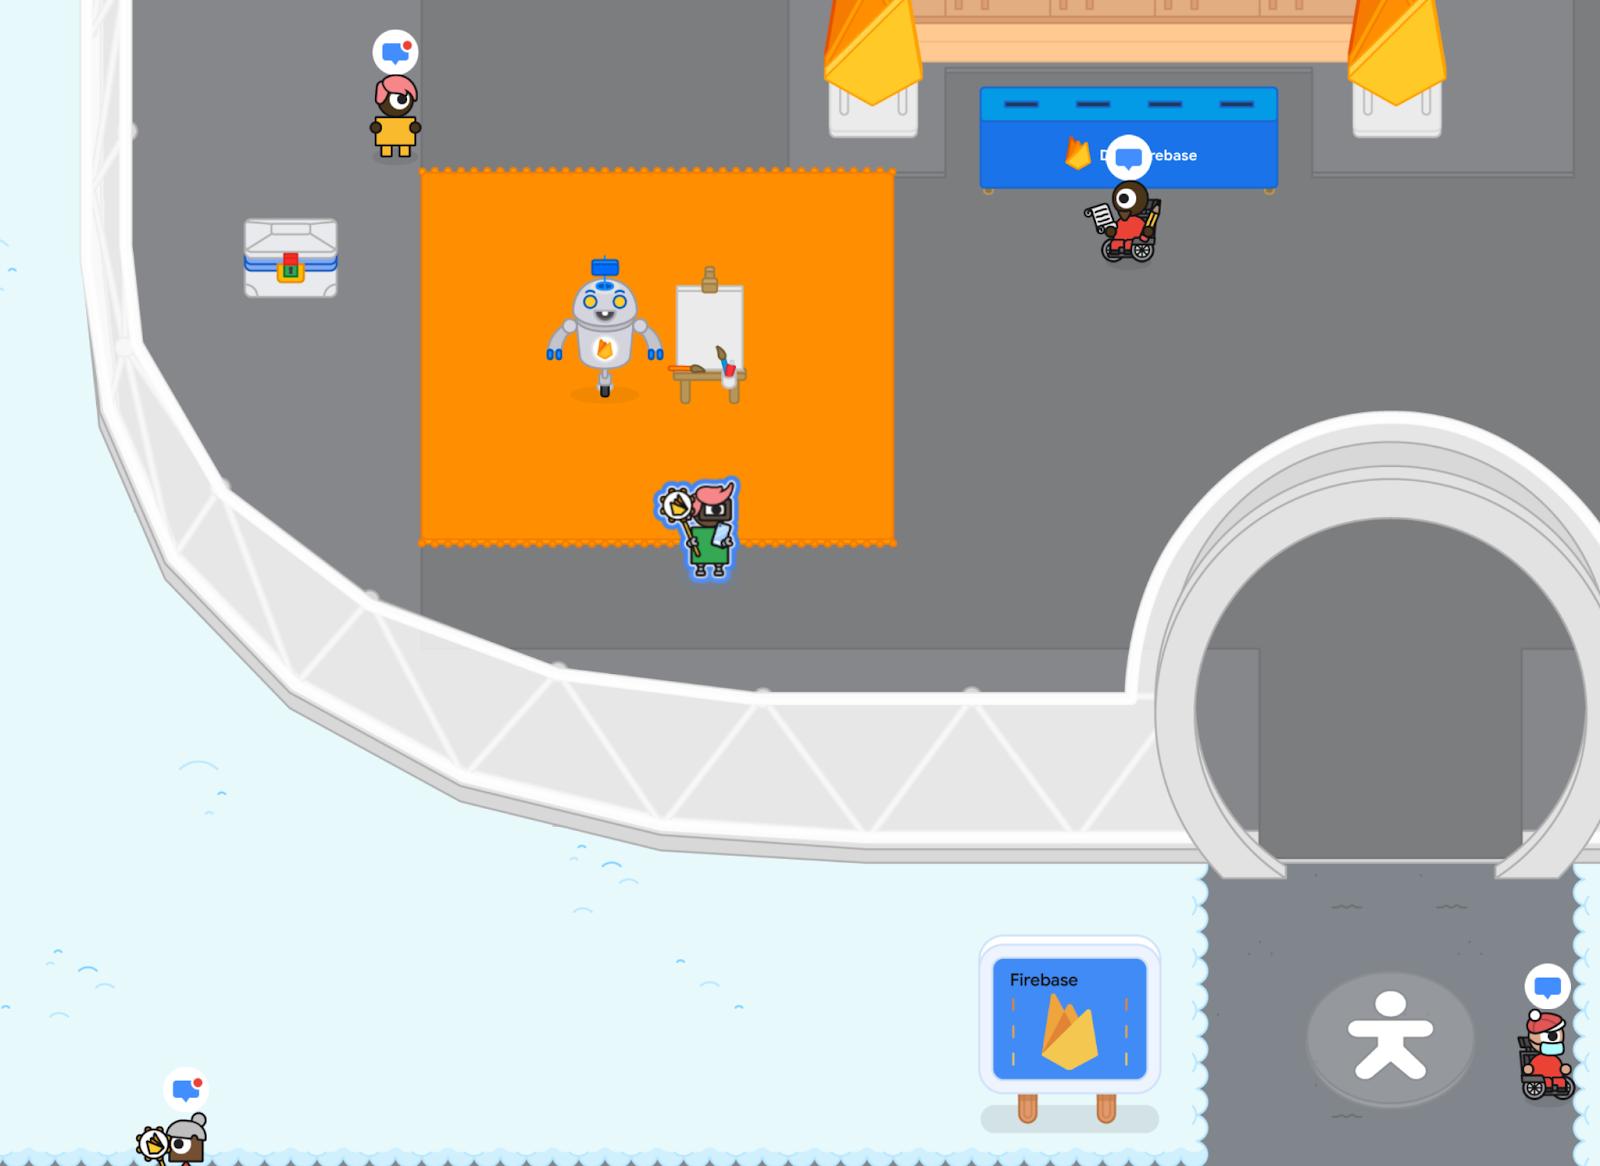 Image from Google IO adventure